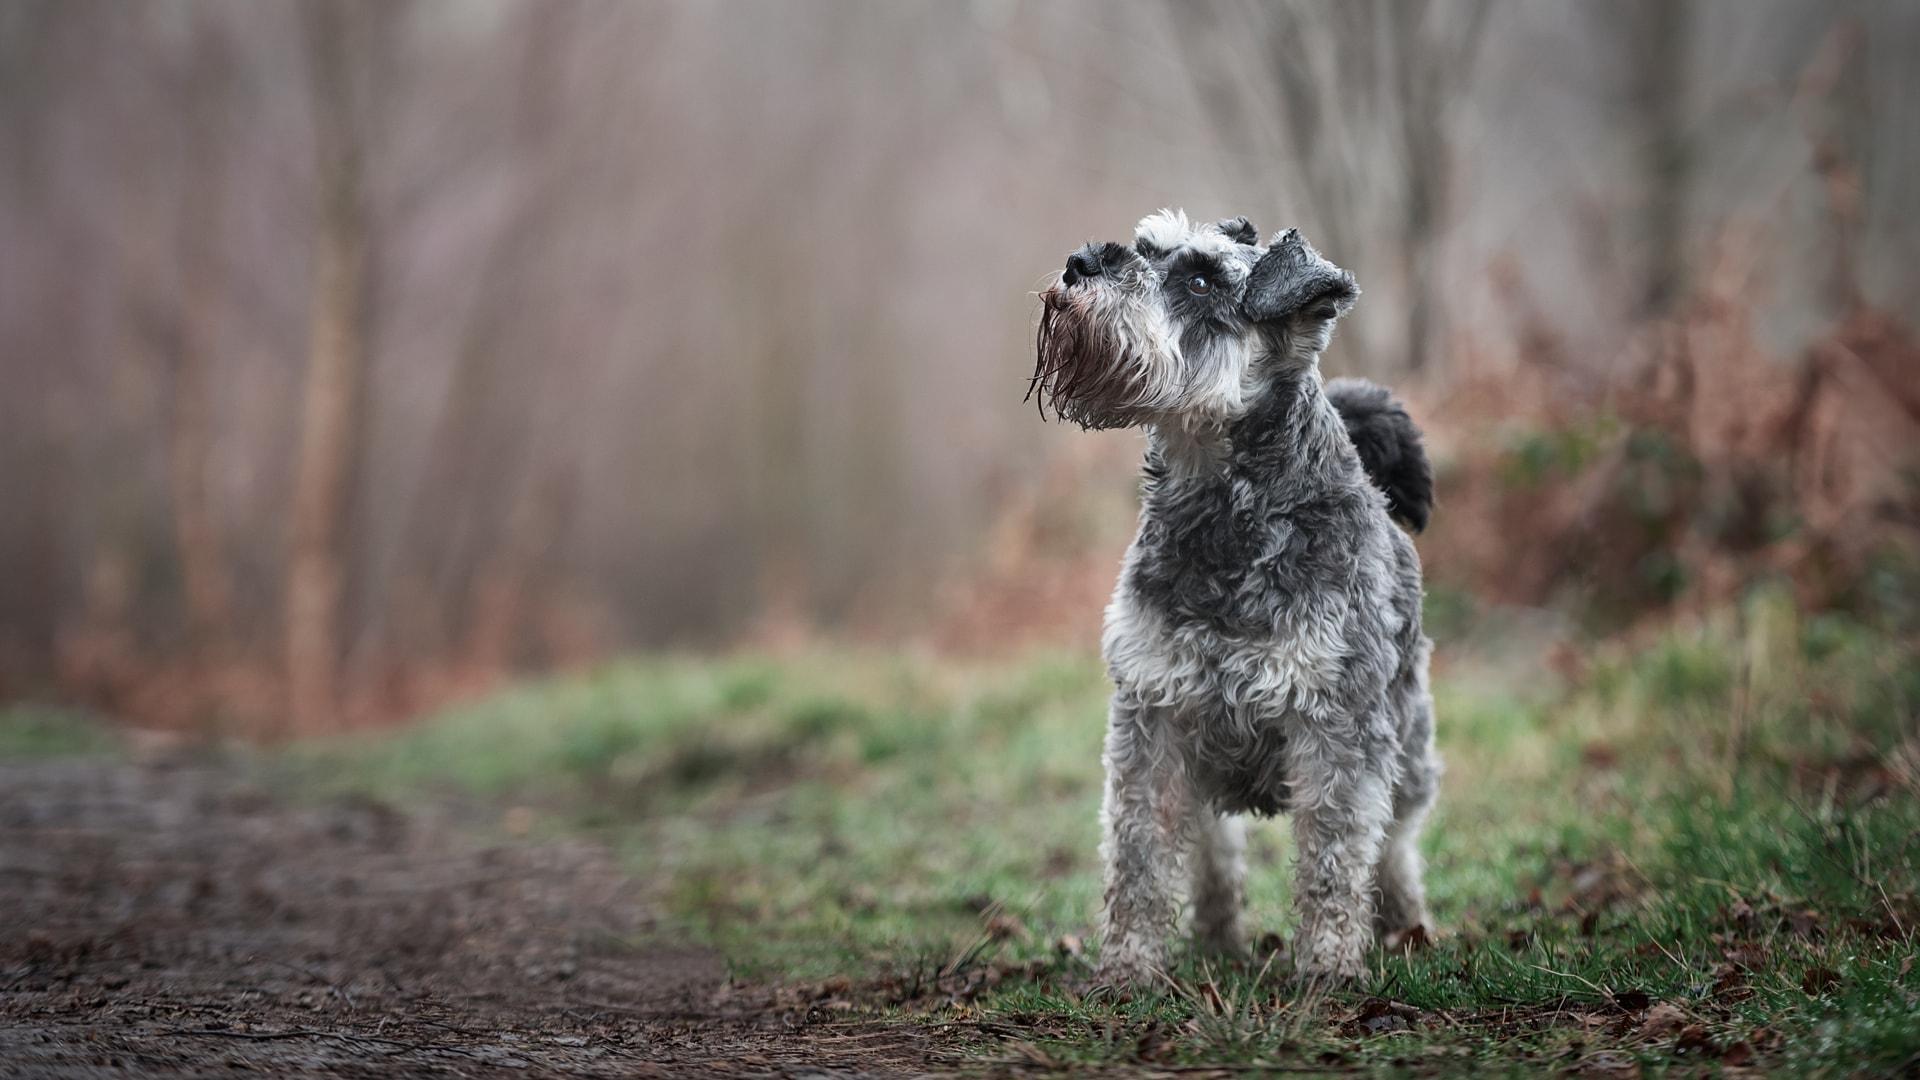 Nic Bisseker Dog Photographer - Autumn Outdoor Photoshoot